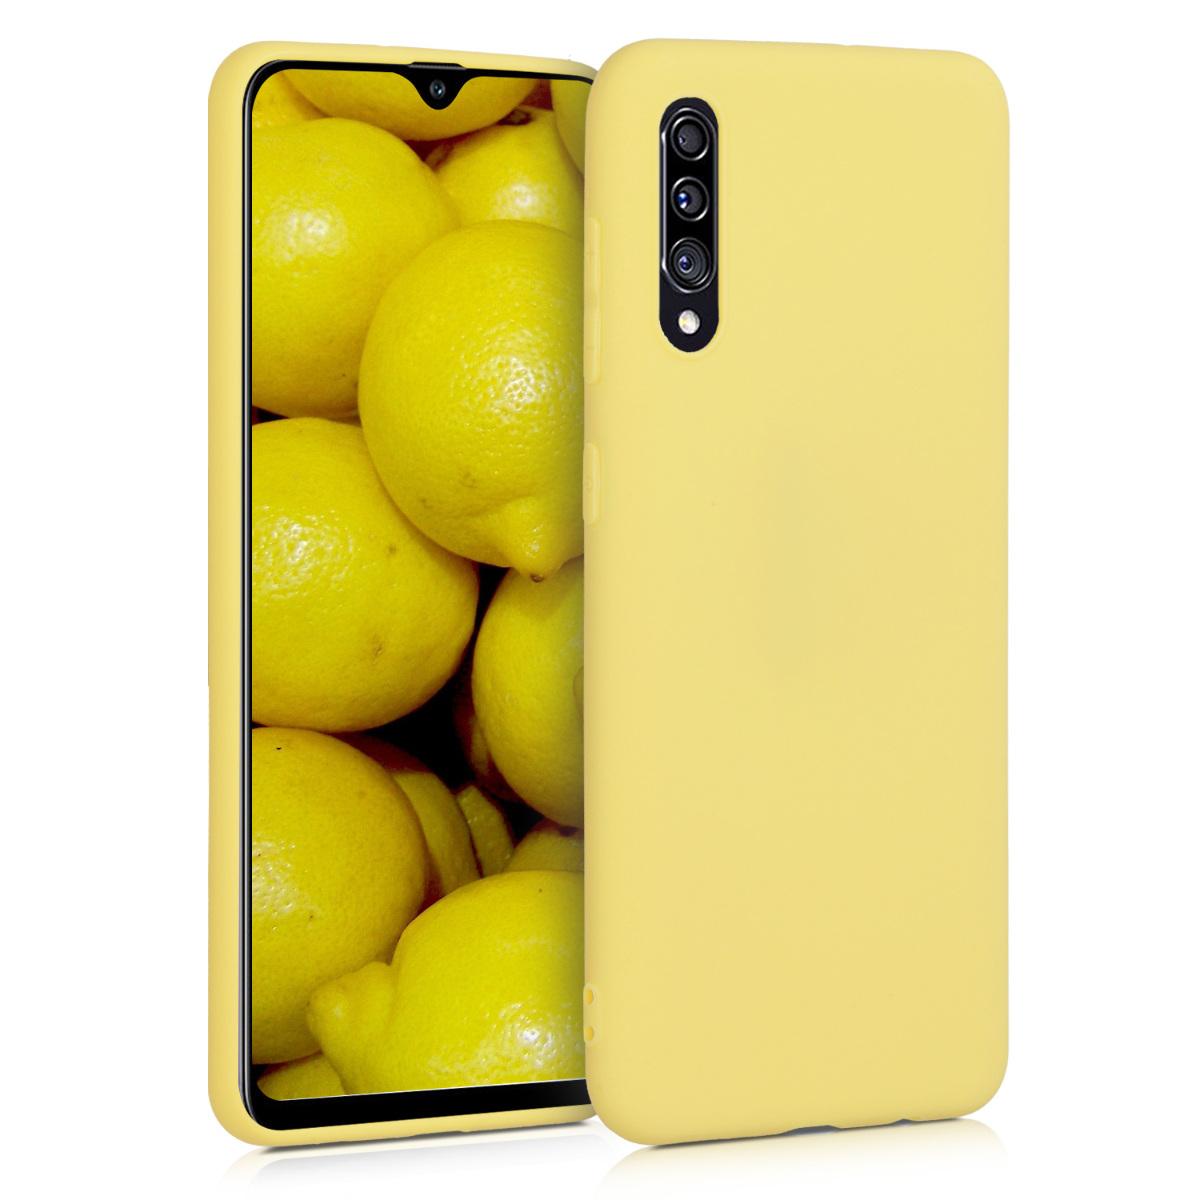 KW Θήκη Σιλικόνης Samsung Galaxy A30s - Yellow Matte (50194.49)